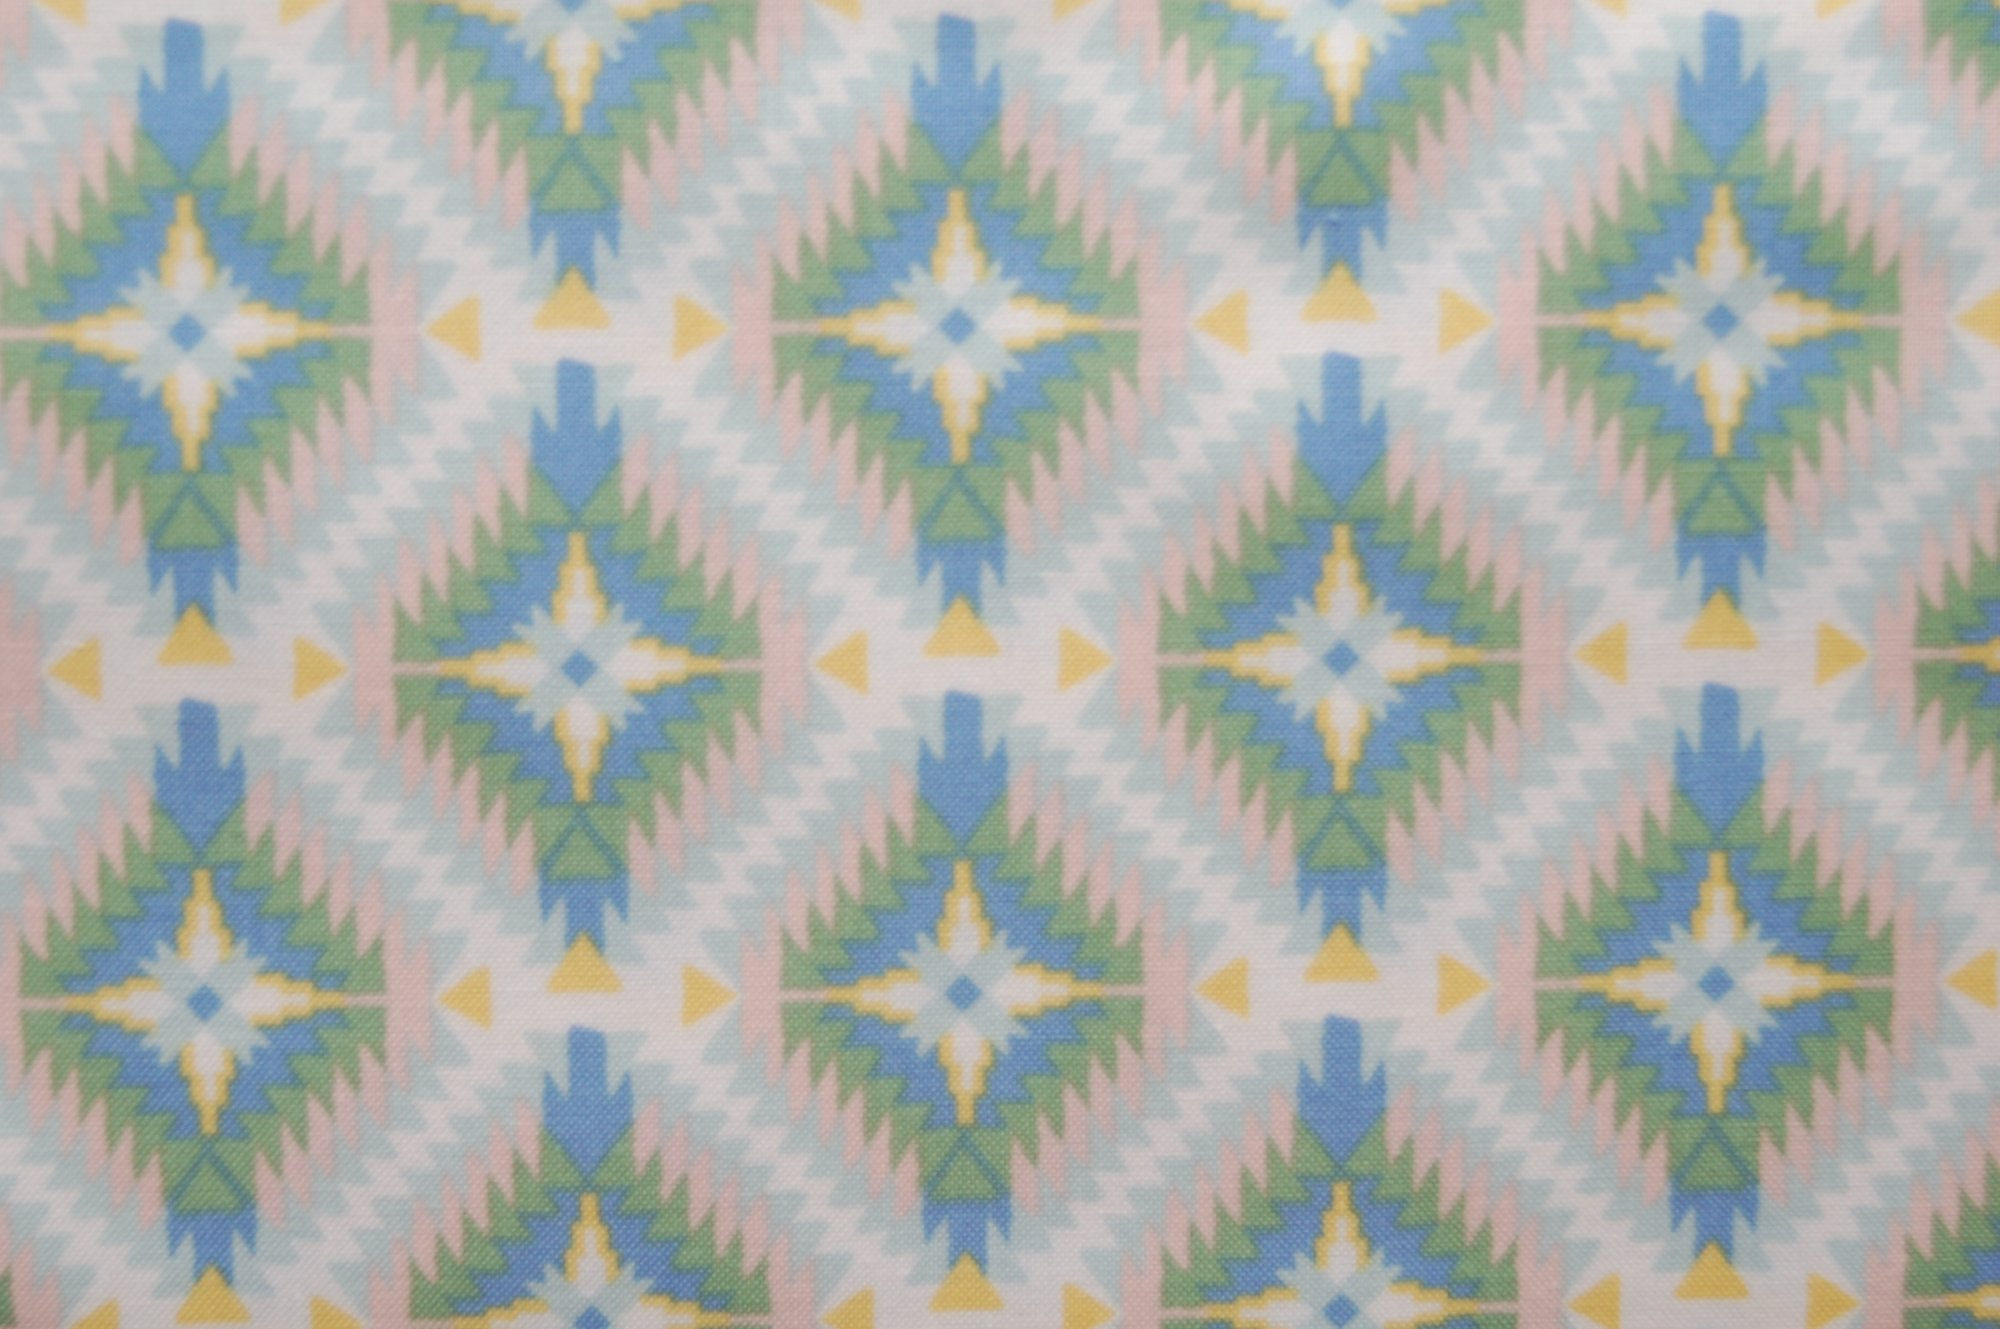 Dream Catcher - Rhythm from Josephine Kimberling for Blend Fabrics